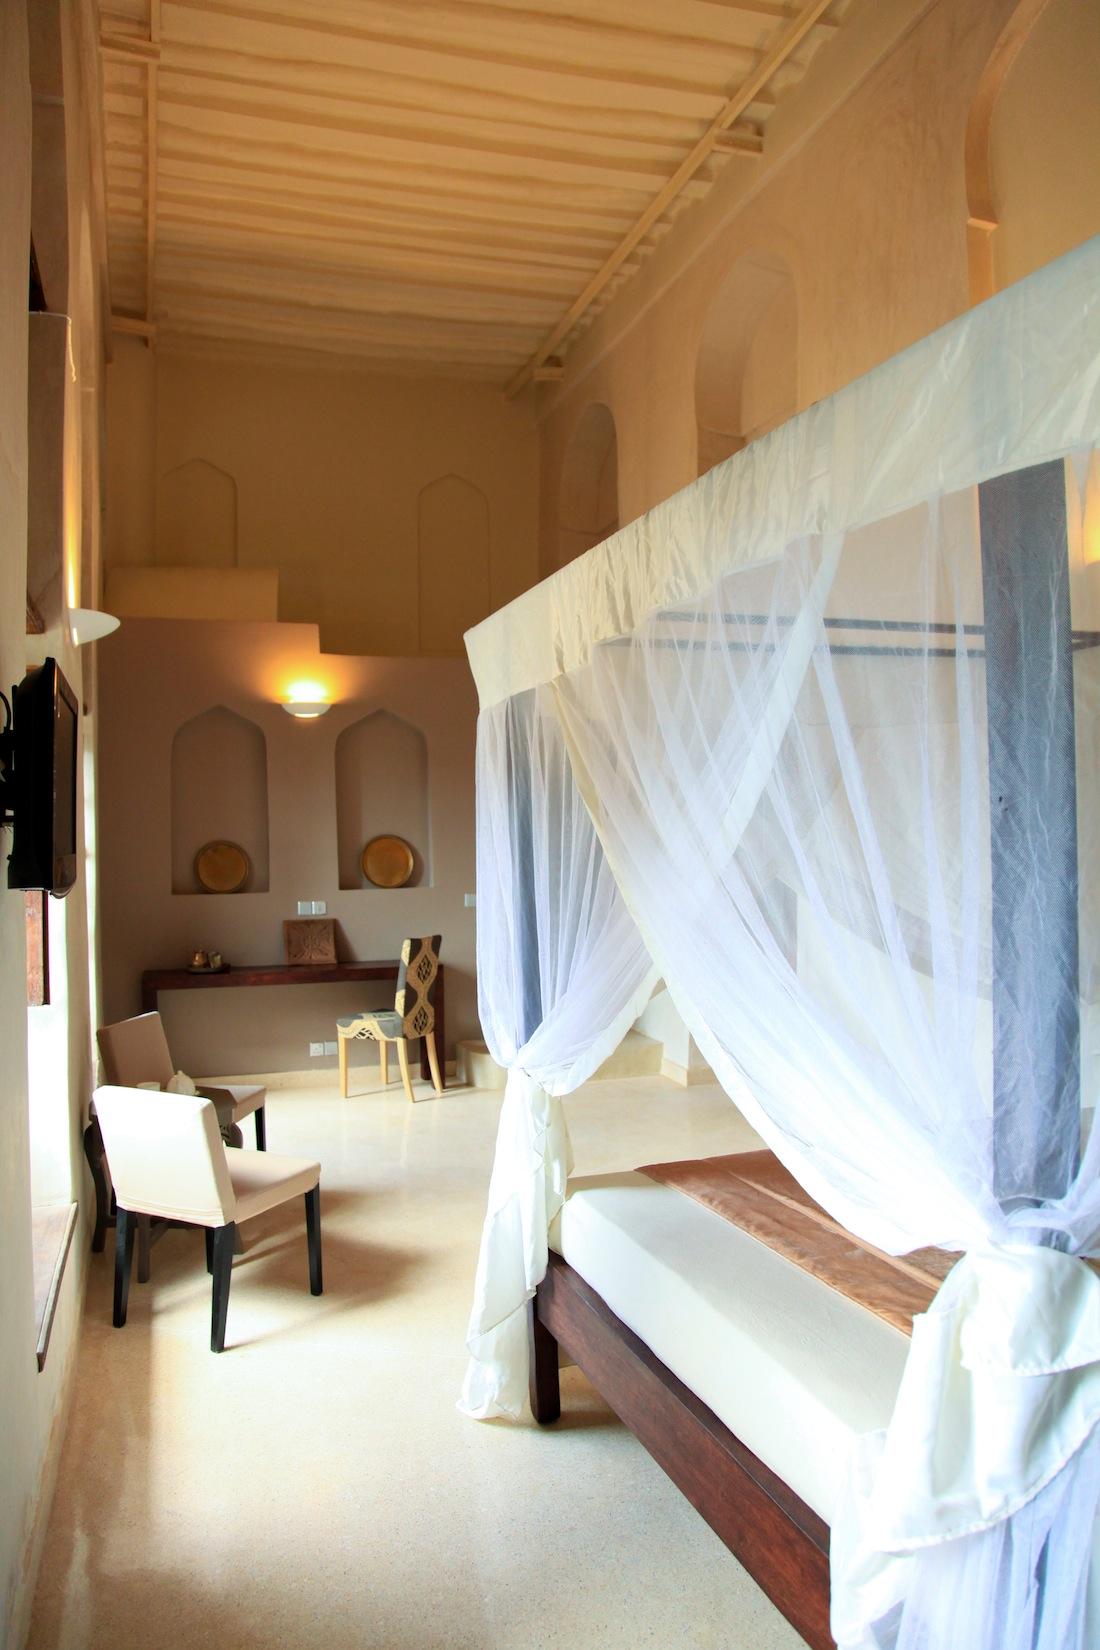 Mashariki-palace-hotel-zanzibar-stone-town-chambres-rooms-04